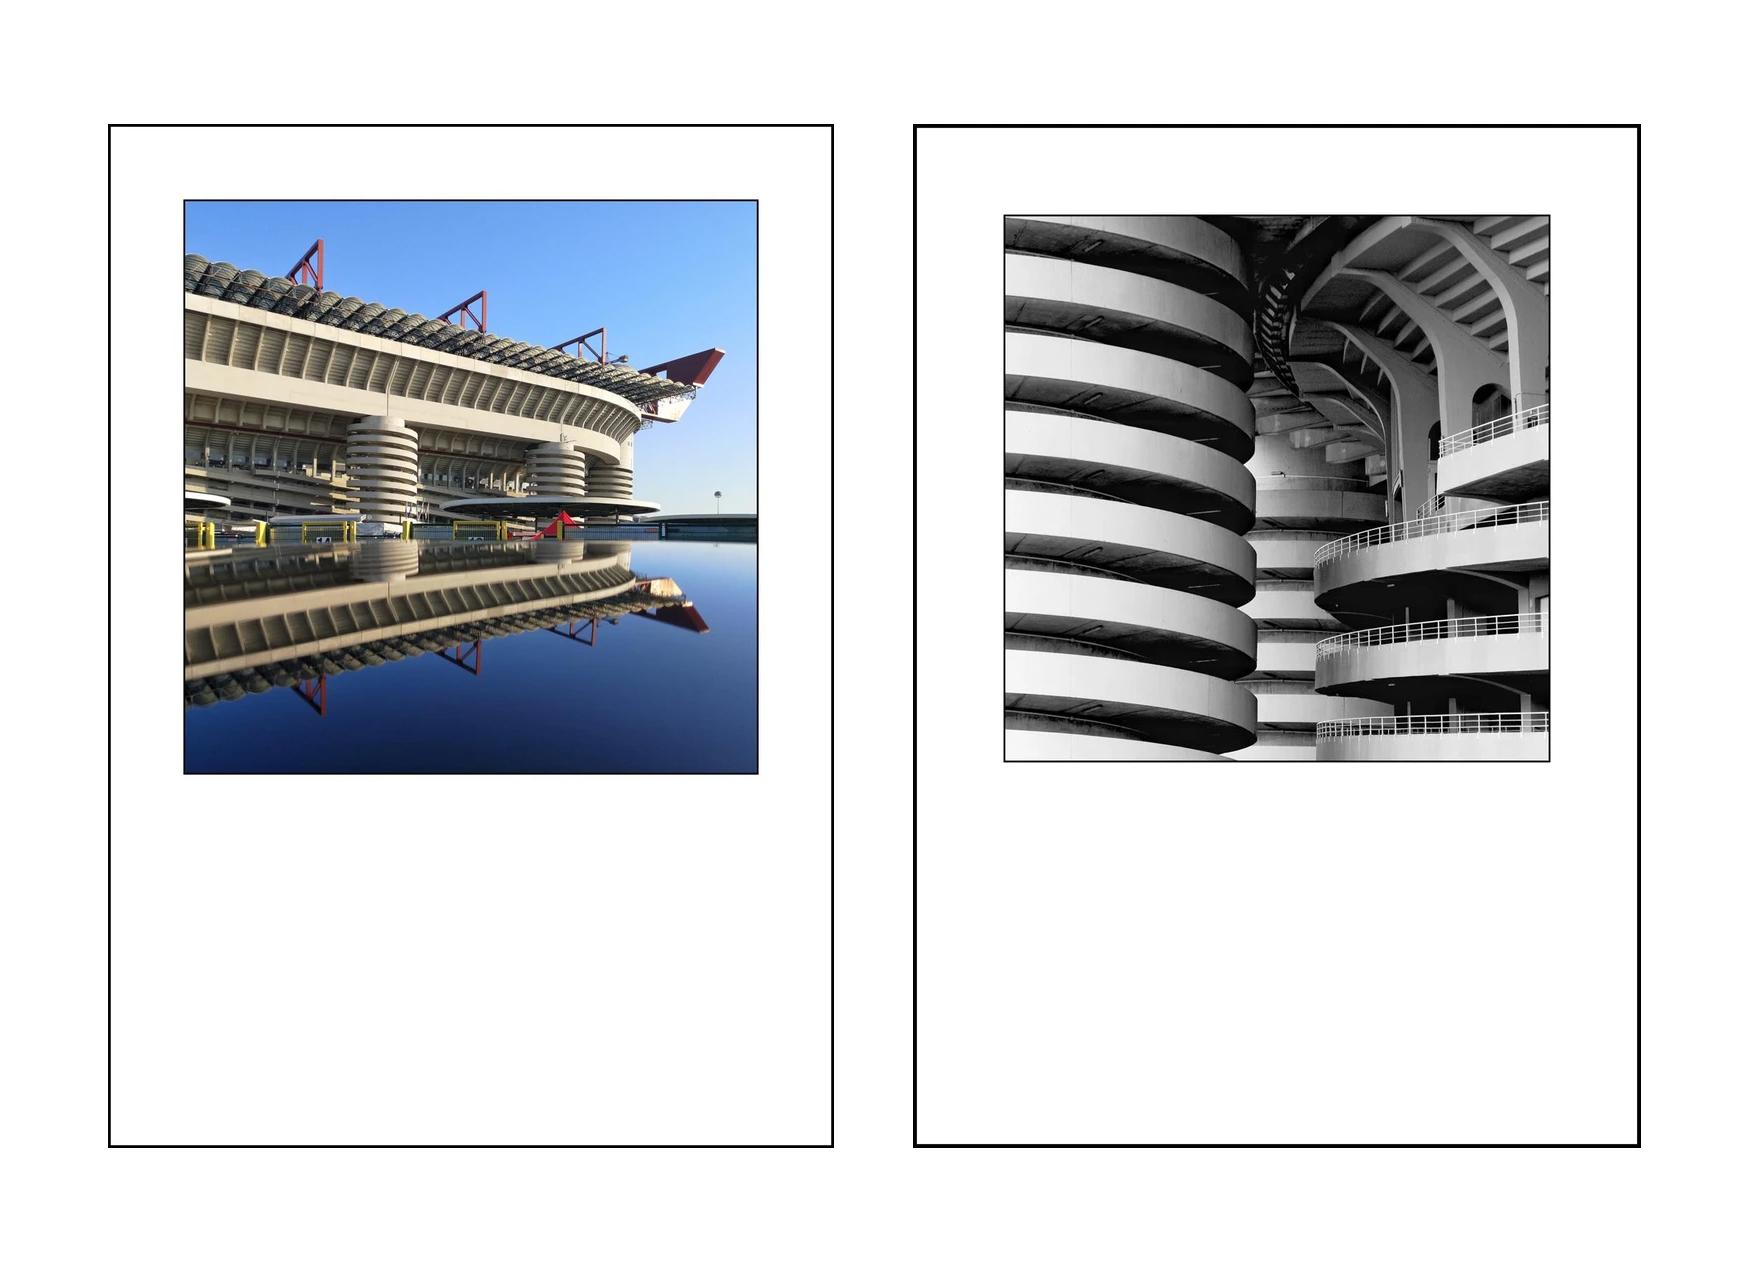 Stadio San Siro - AC Milan and Internazionale